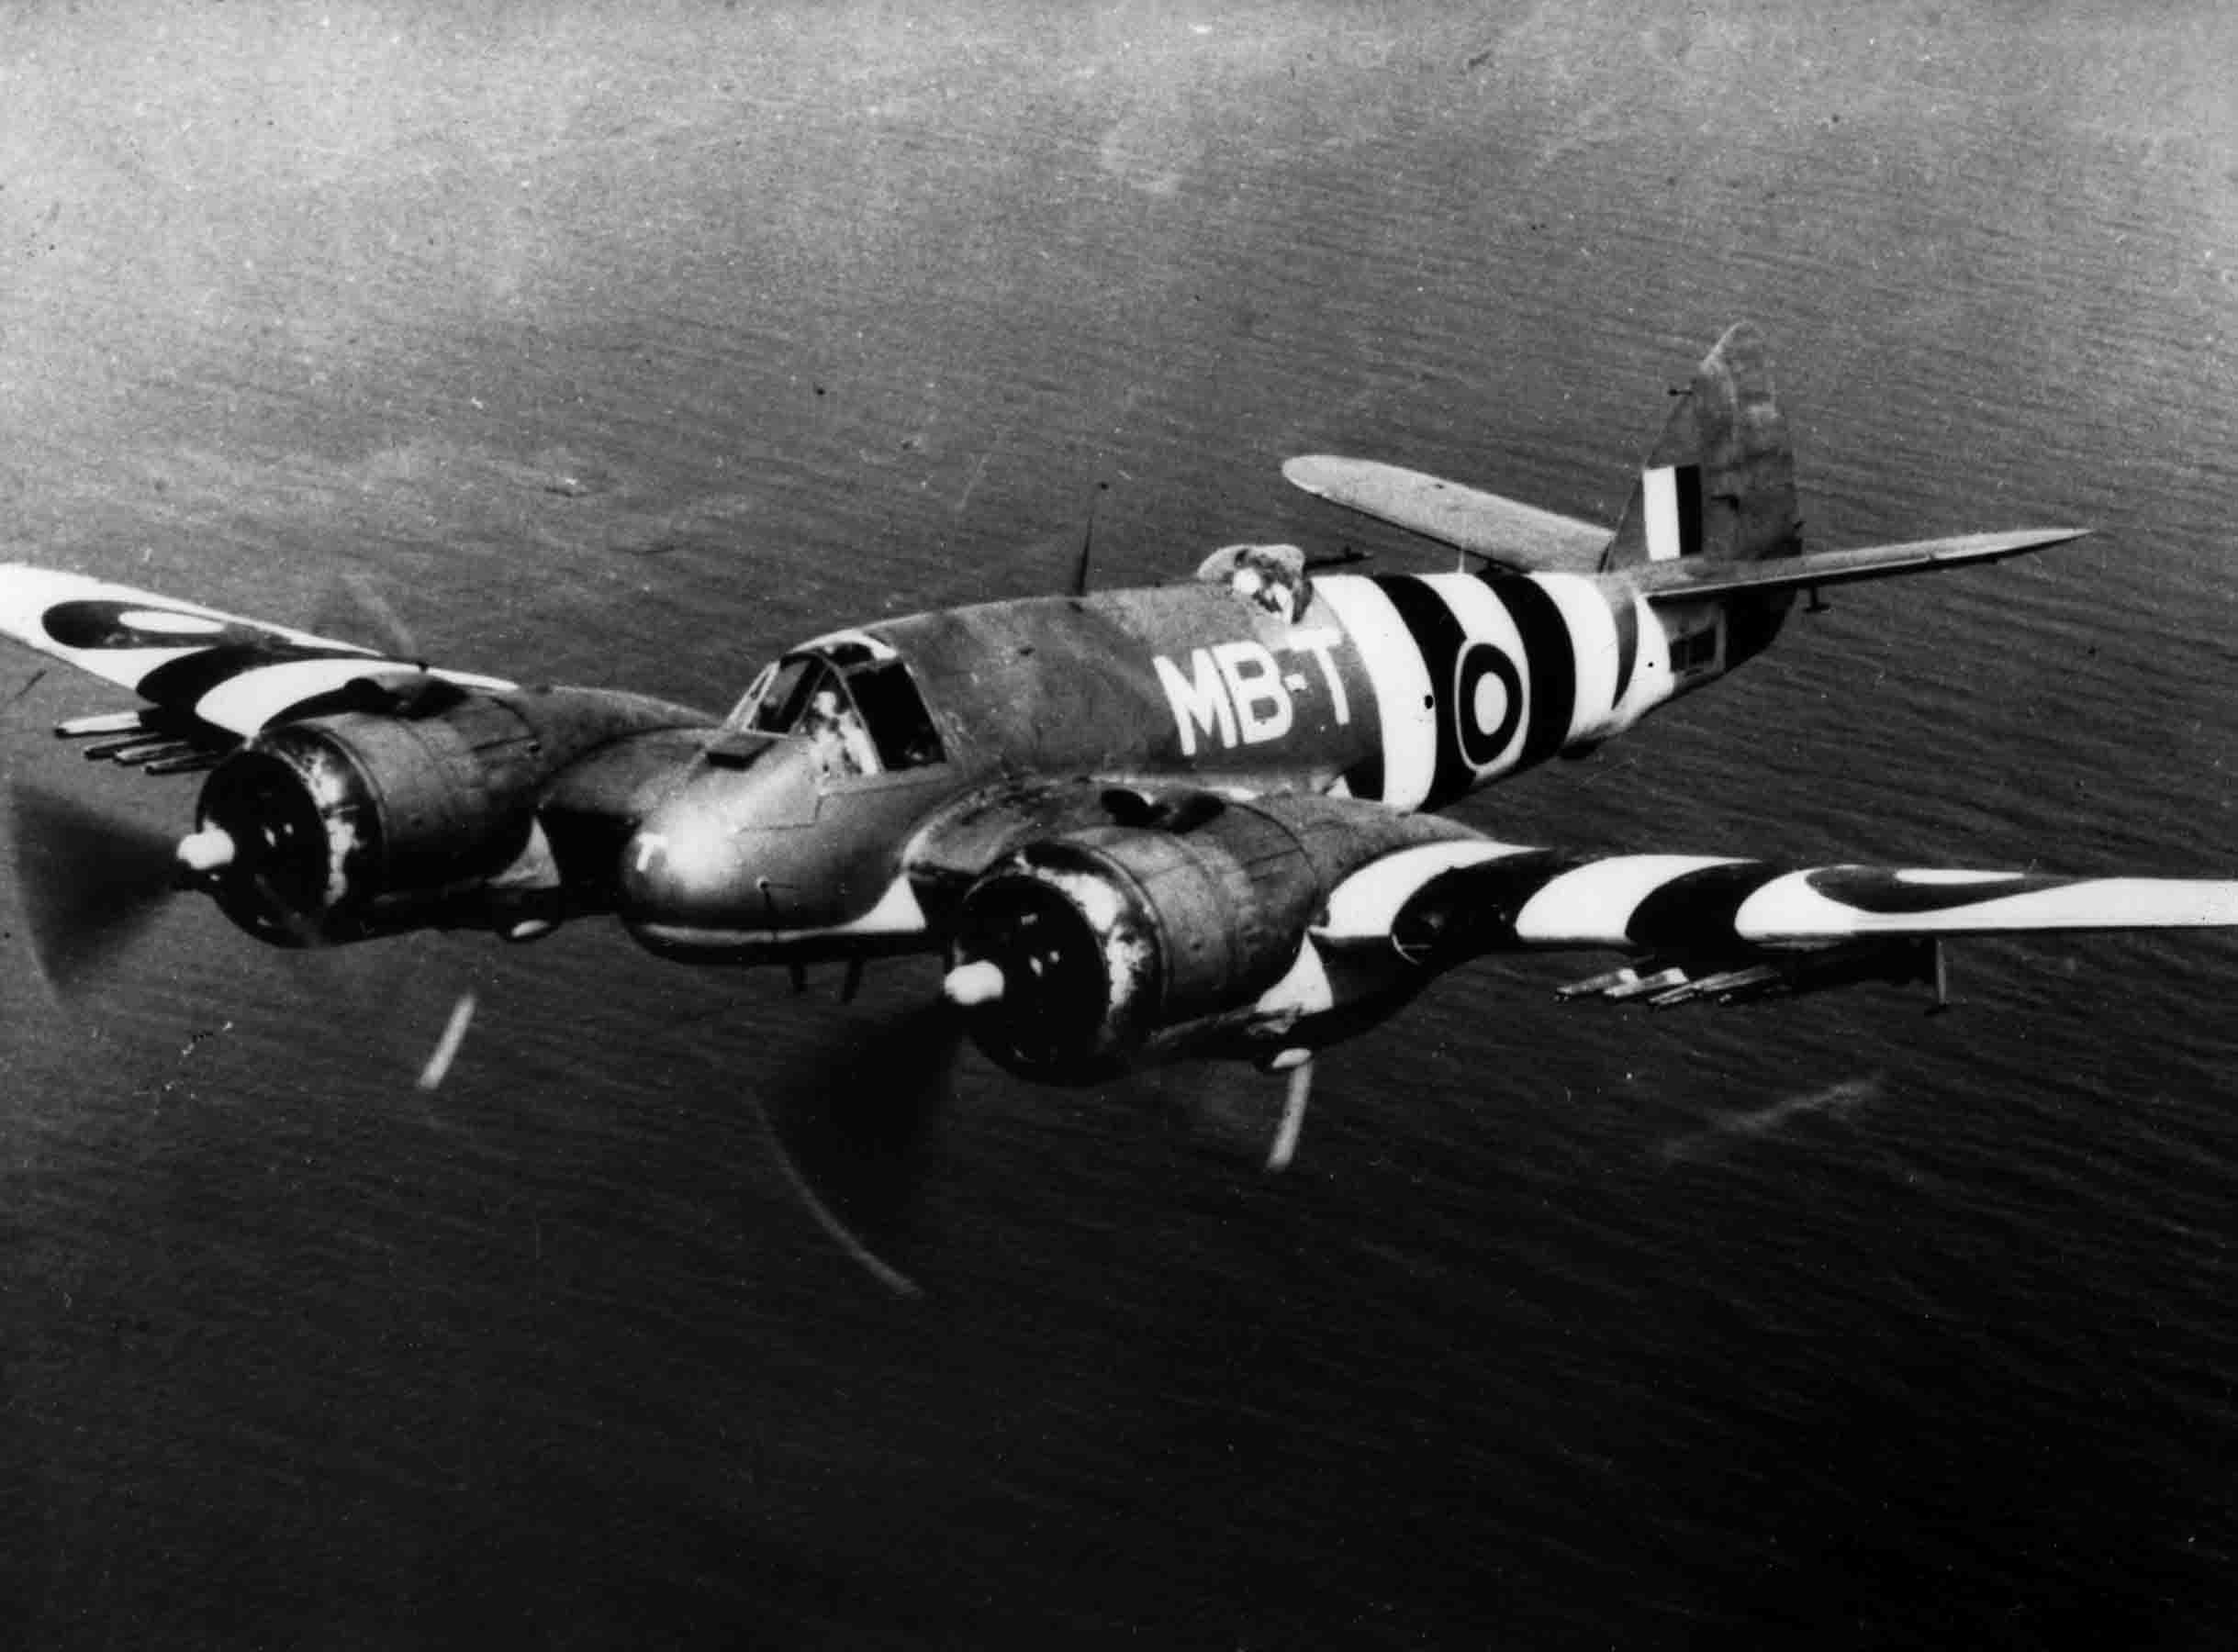 Bristol Beaufighter in invasion colours